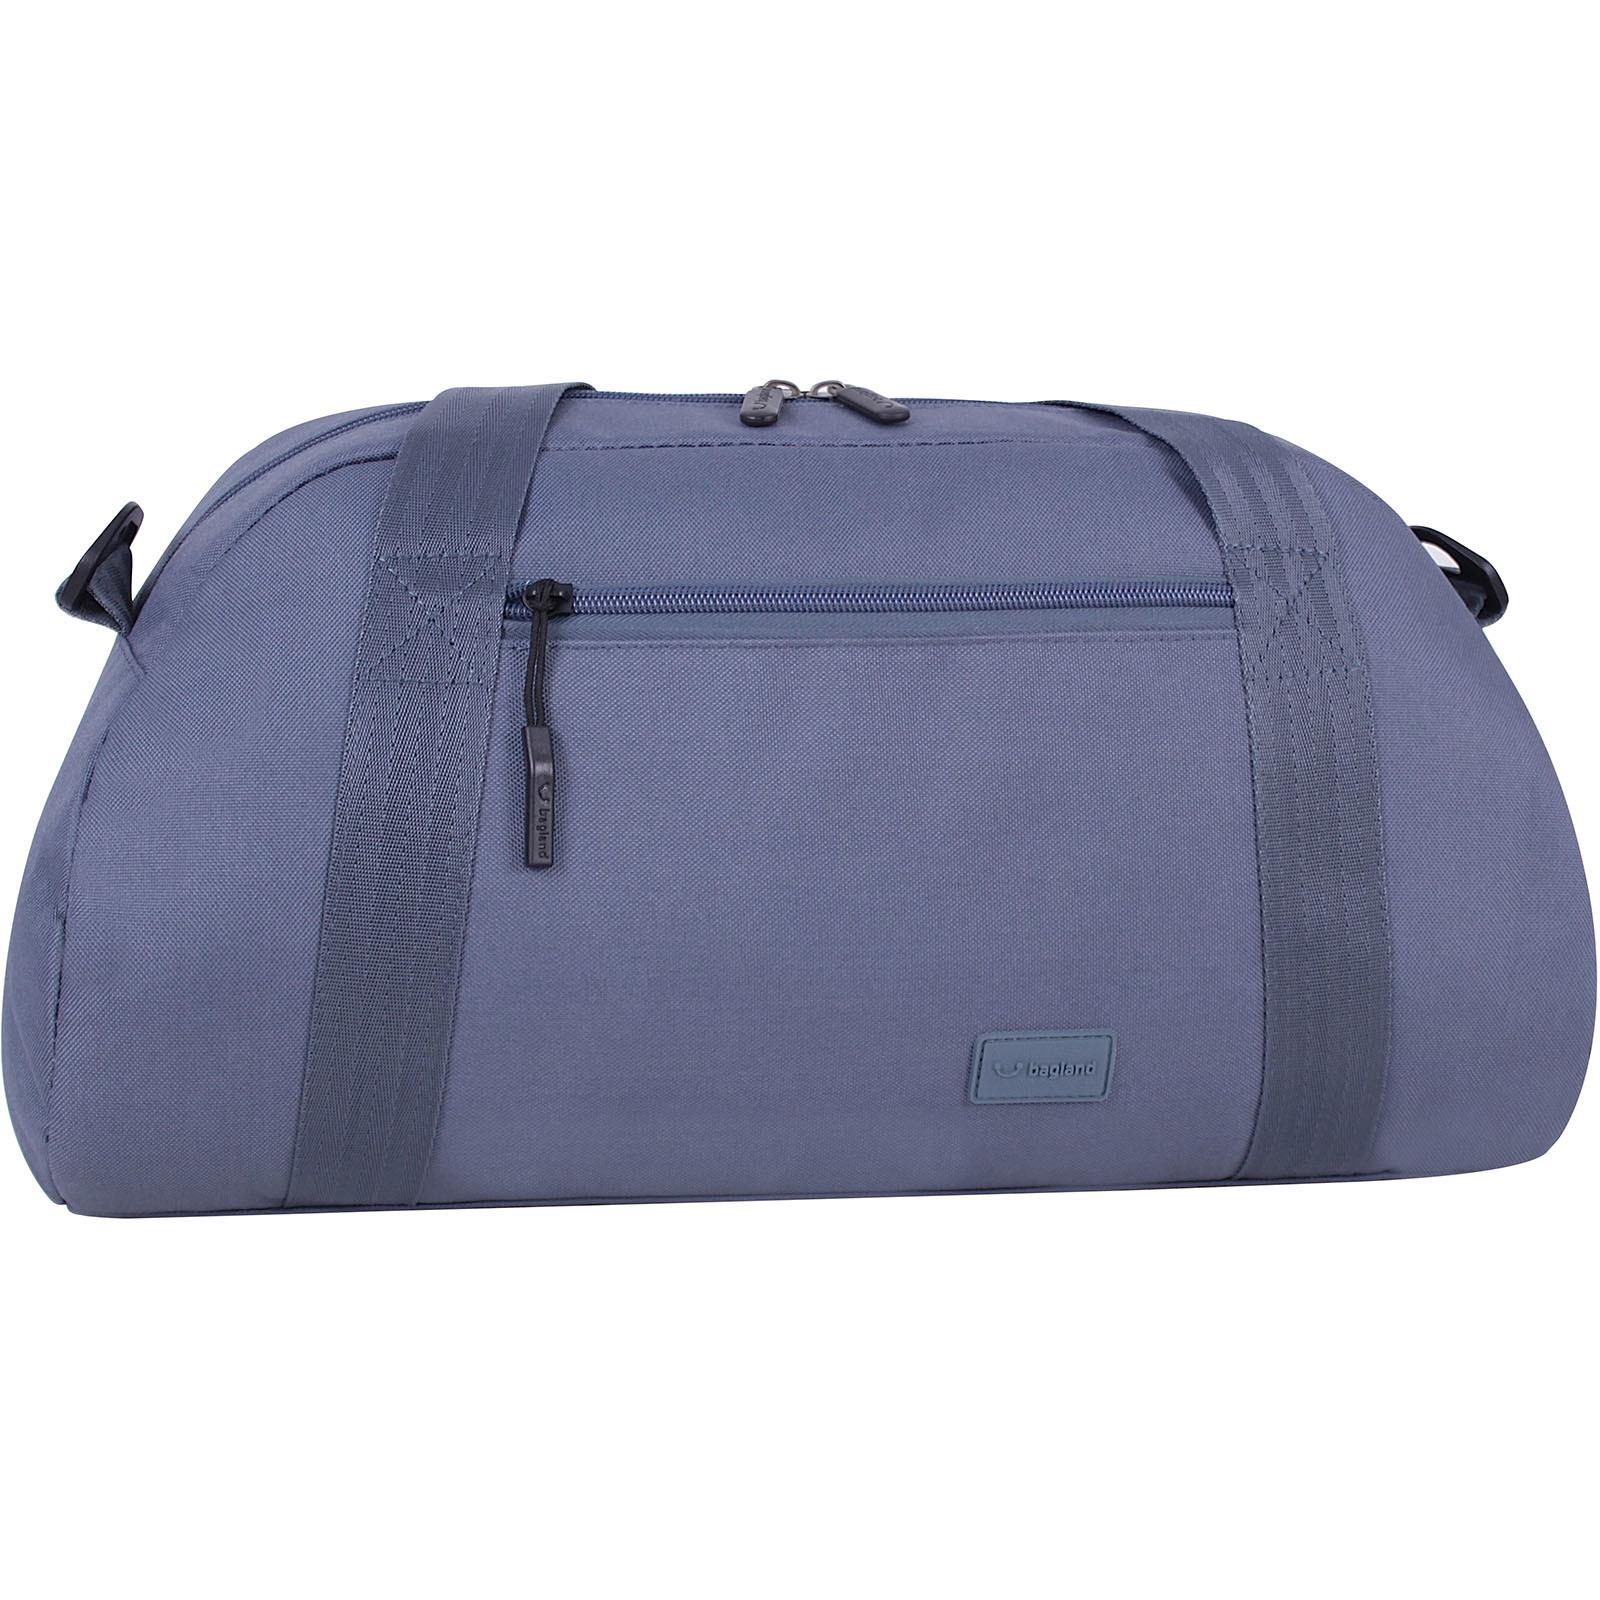 Спортивные сумки Сумка Bagland Oblivion 27 л. Серый (0037366) IMG_6301.JPG